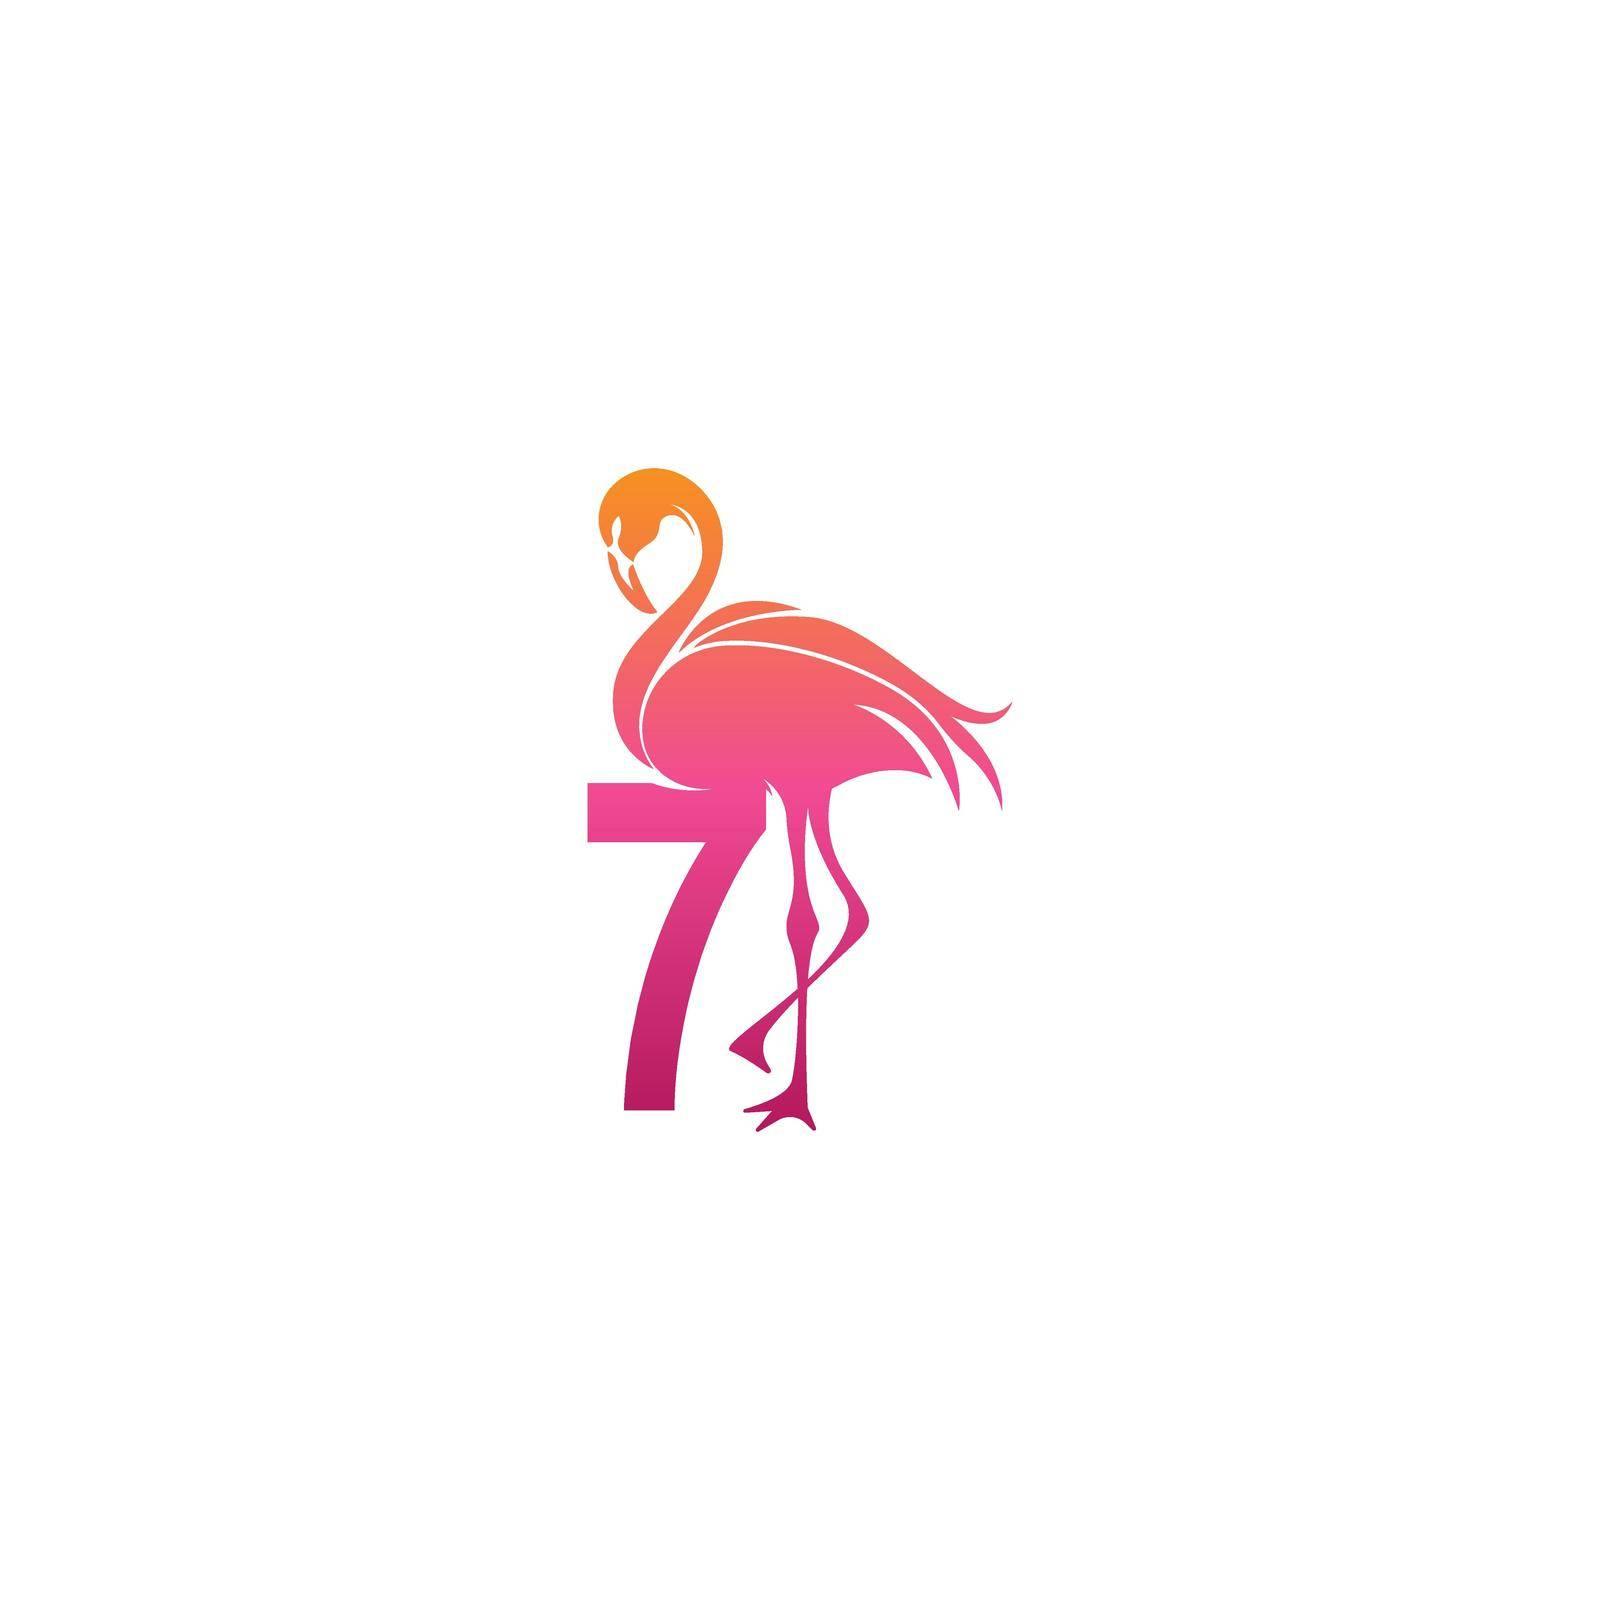 Flamingo bird icon with Number 7 Logo design vector template